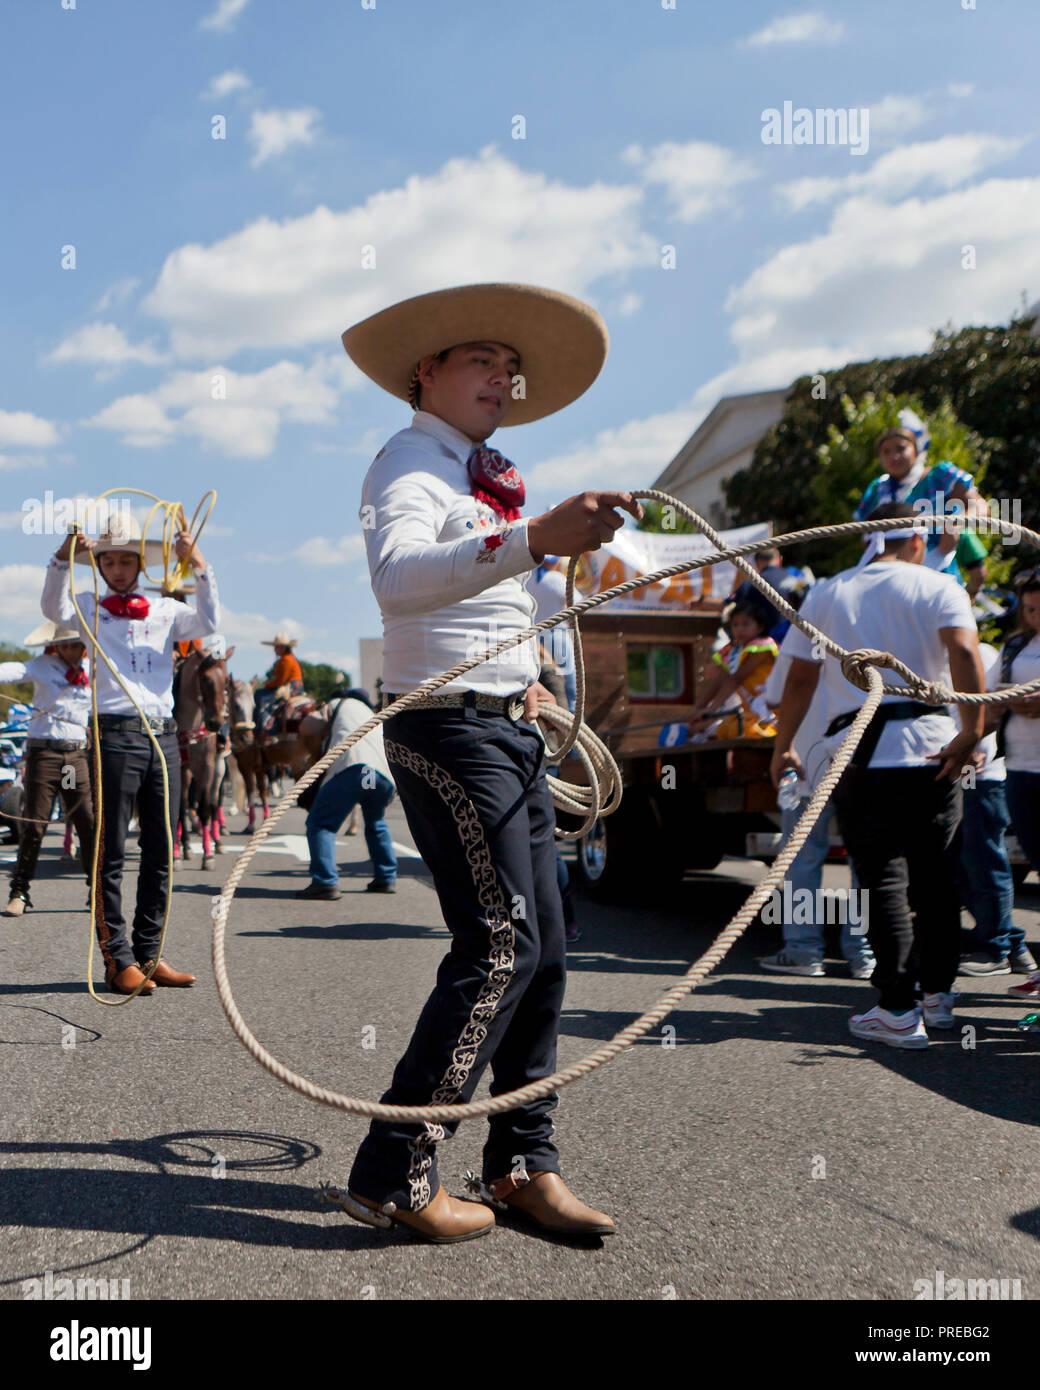 A Vaquero (Mexican cowboy) spinning a lasso - Stock Image